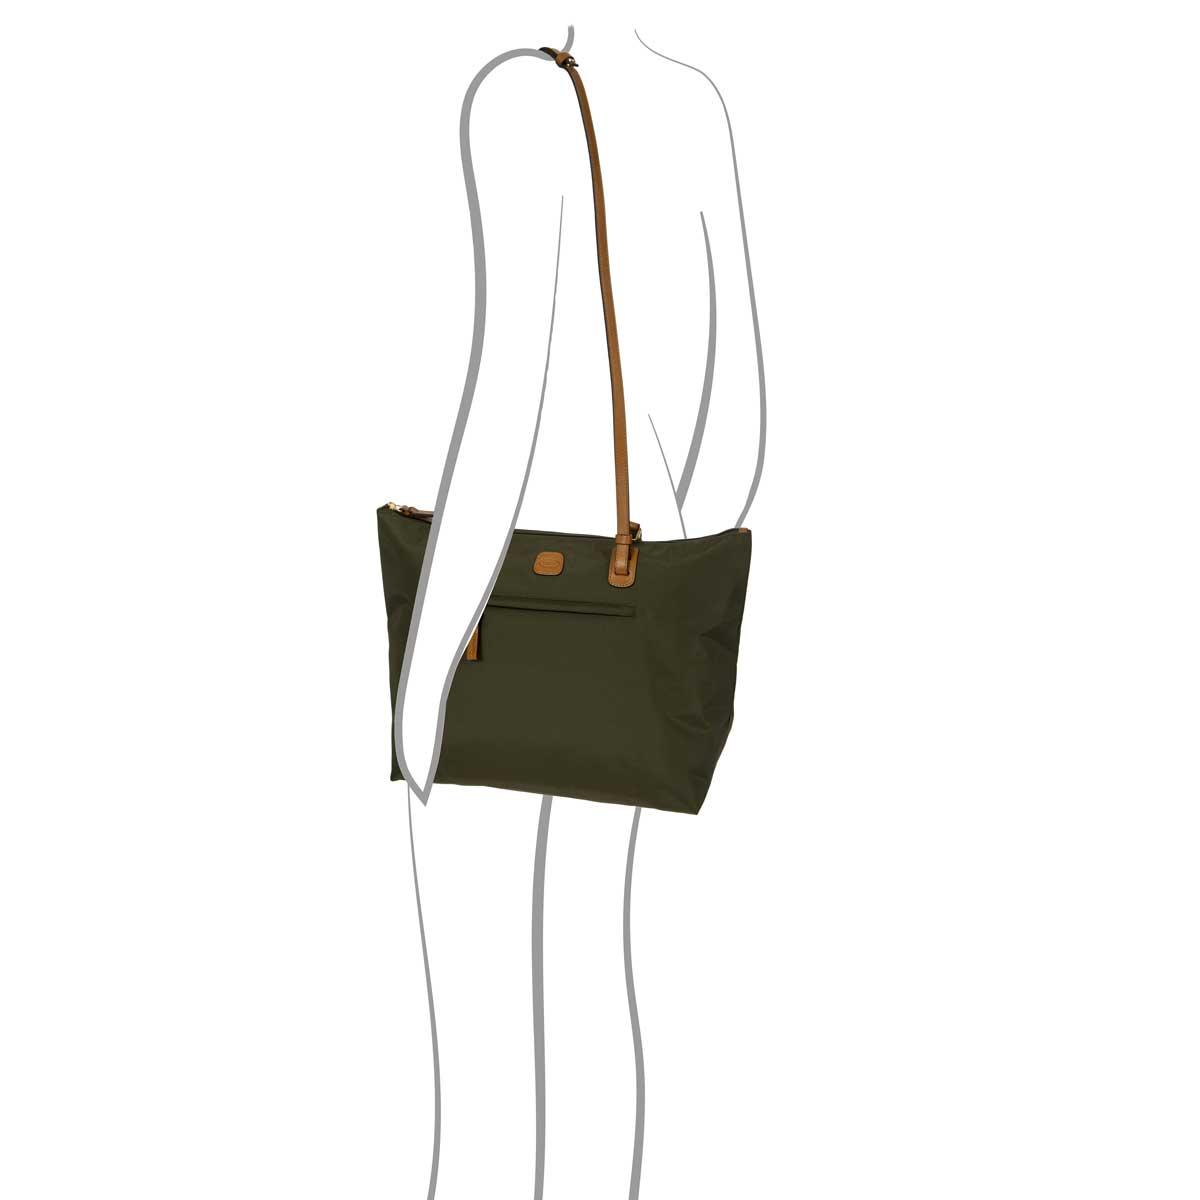 774c282f273 X-Bag Large Sportina 3-Way Shopper Tote Bag - Olive